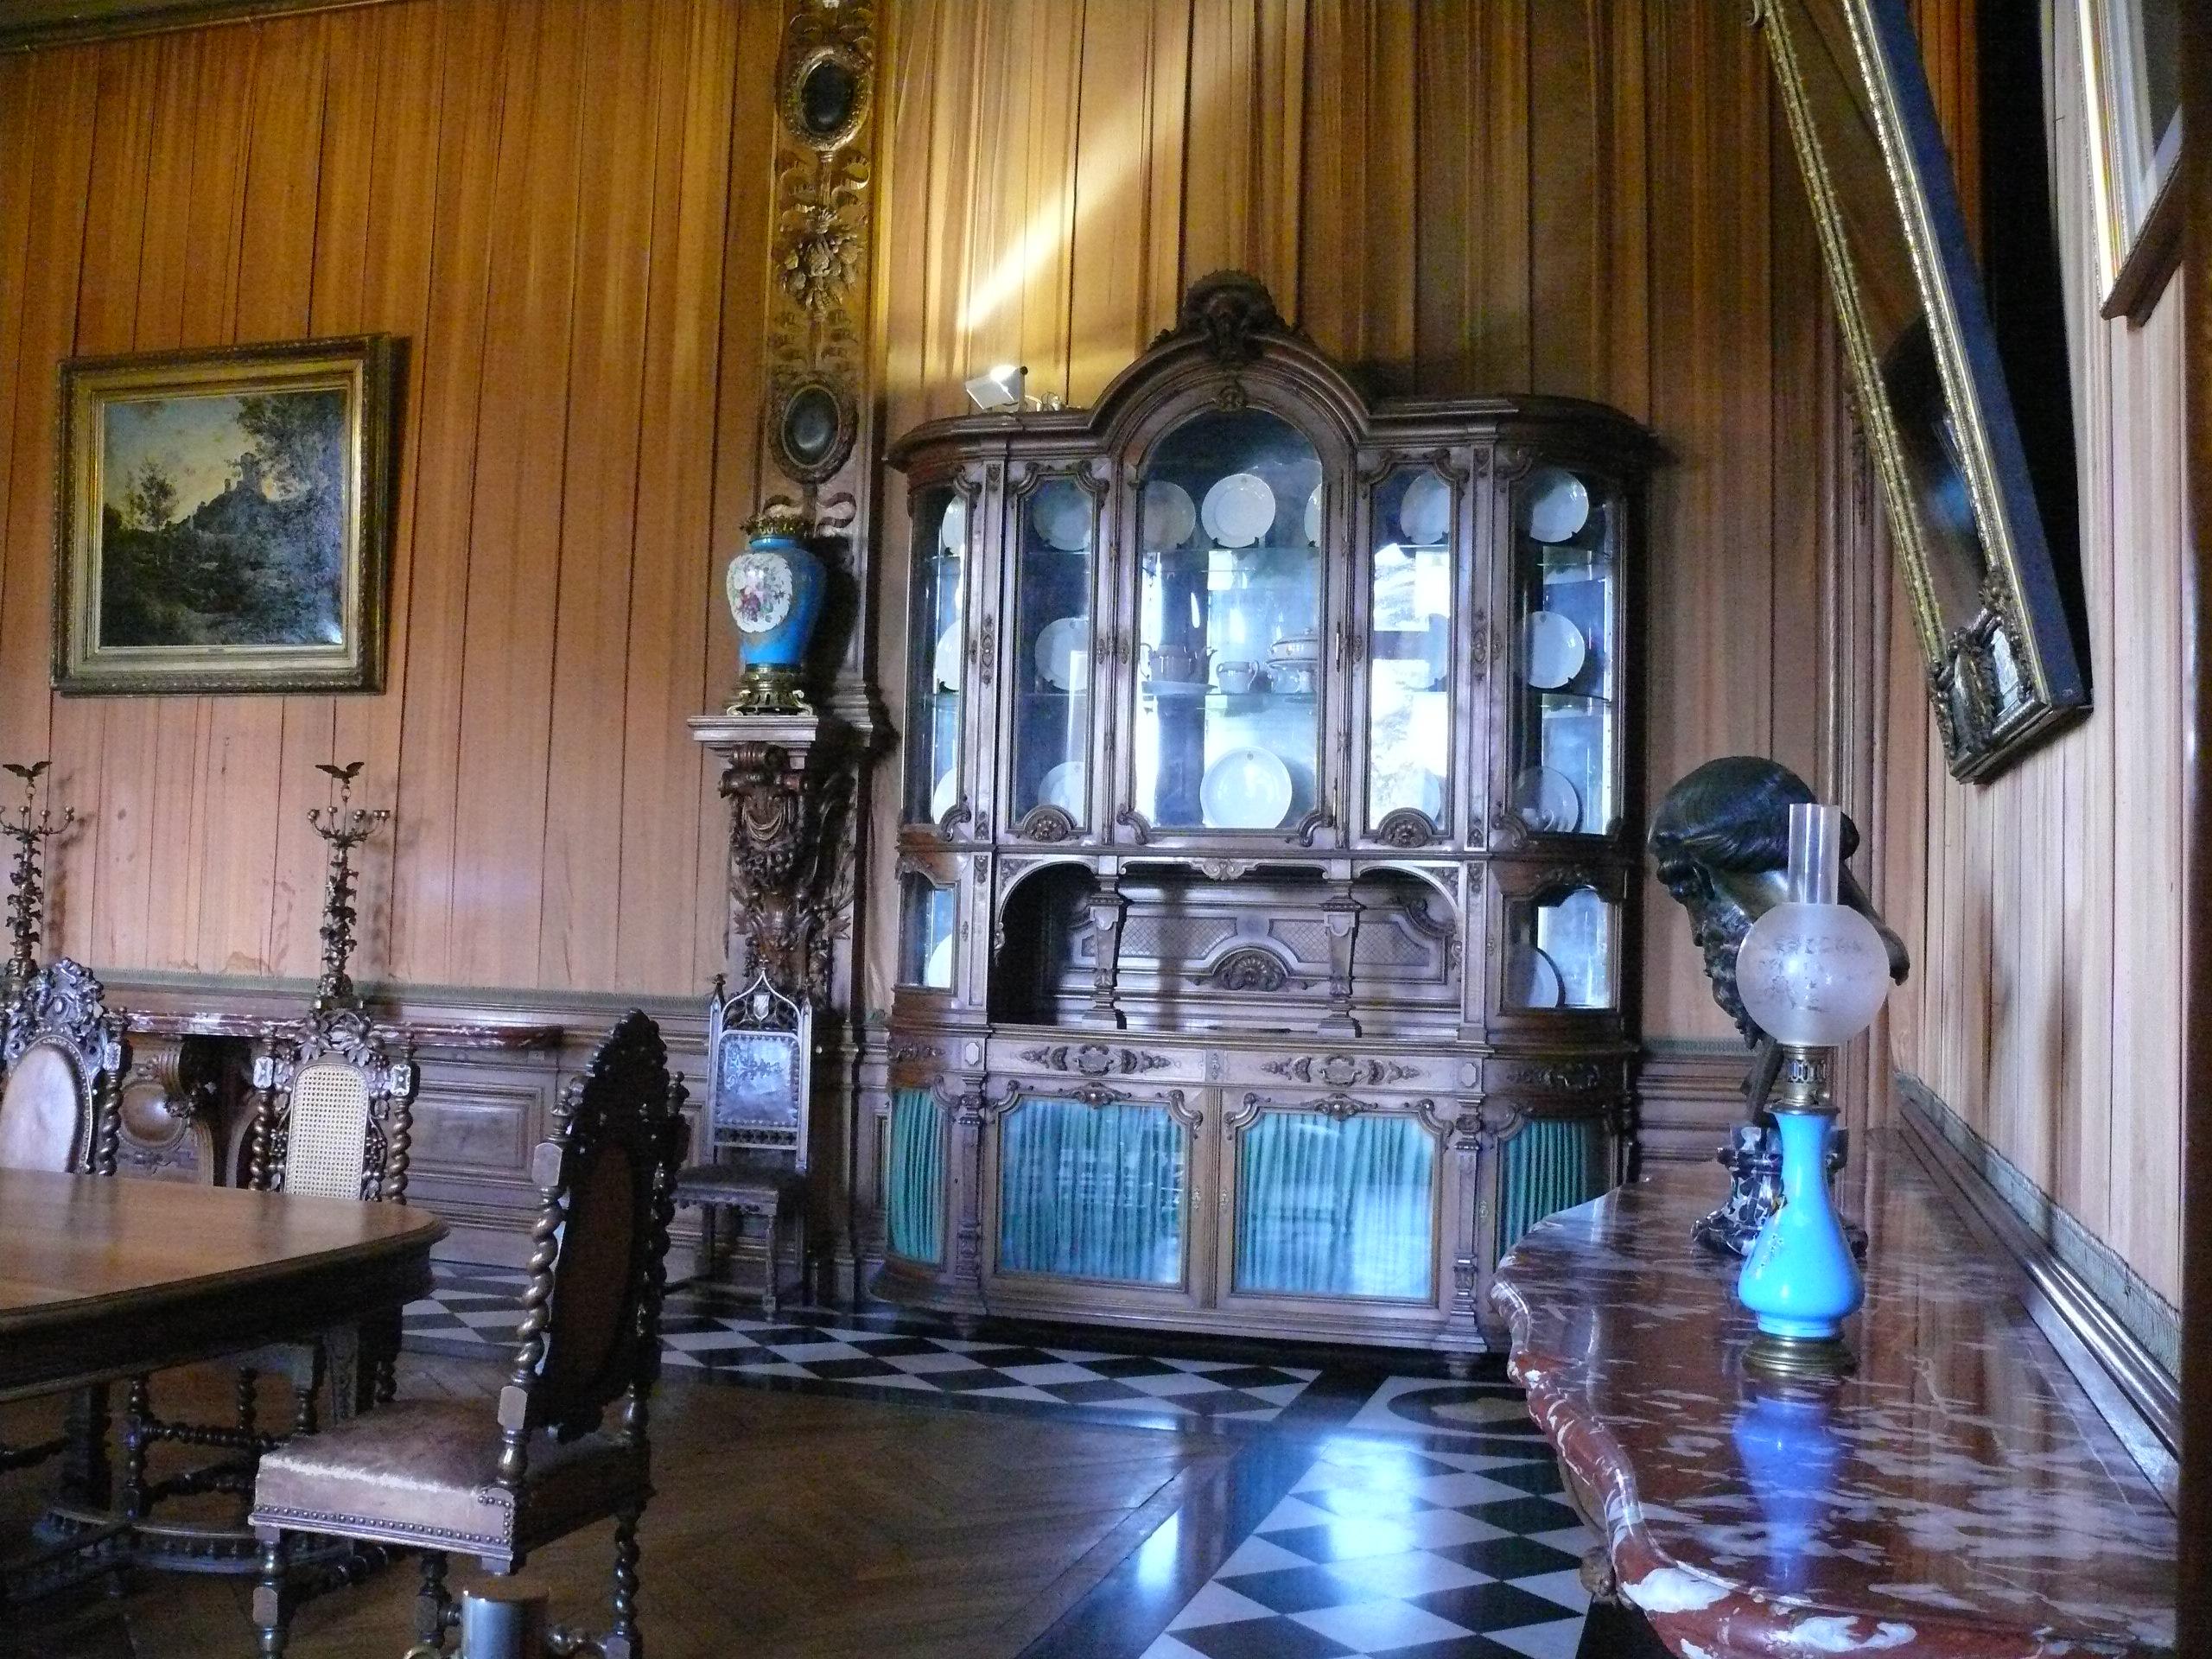 file ch teau de ferri res ferri res en brie salle manger wikimedia commons. Black Bedroom Furniture Sets. Home Design Ideas